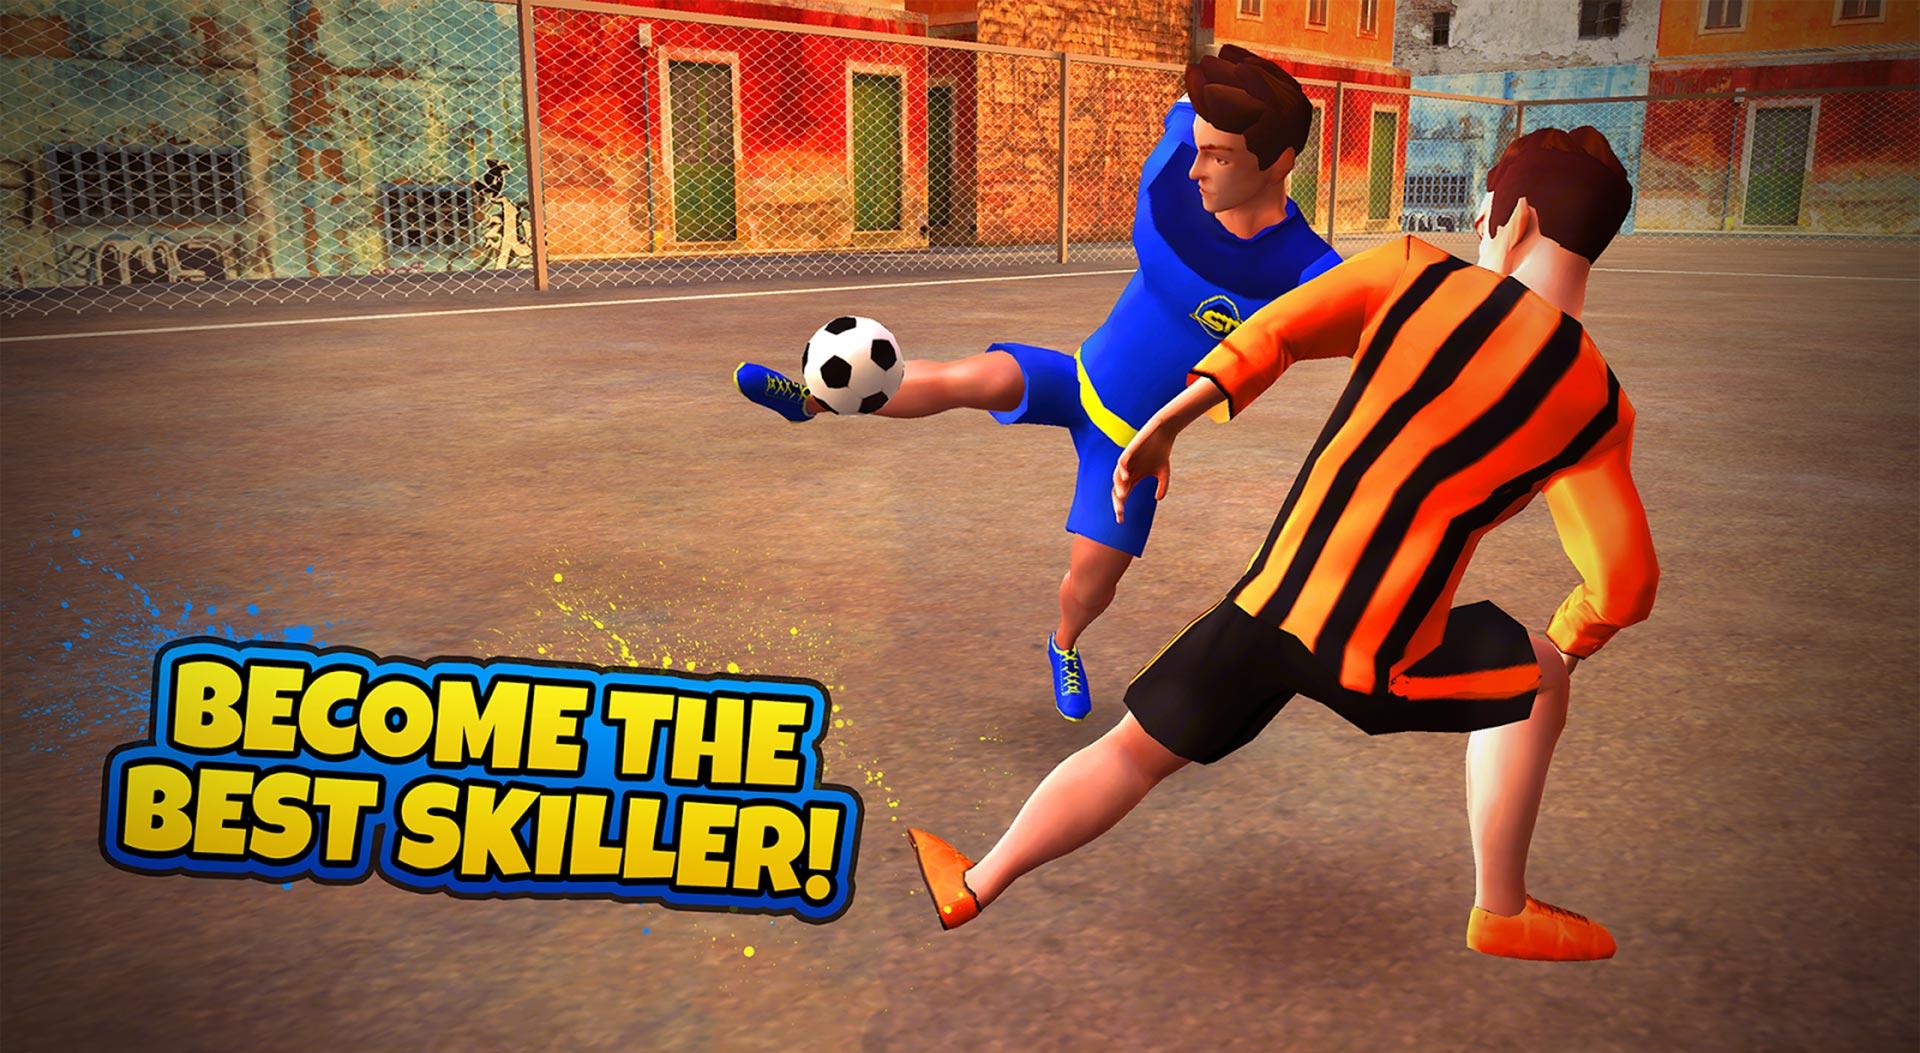 SkillTwins videogame